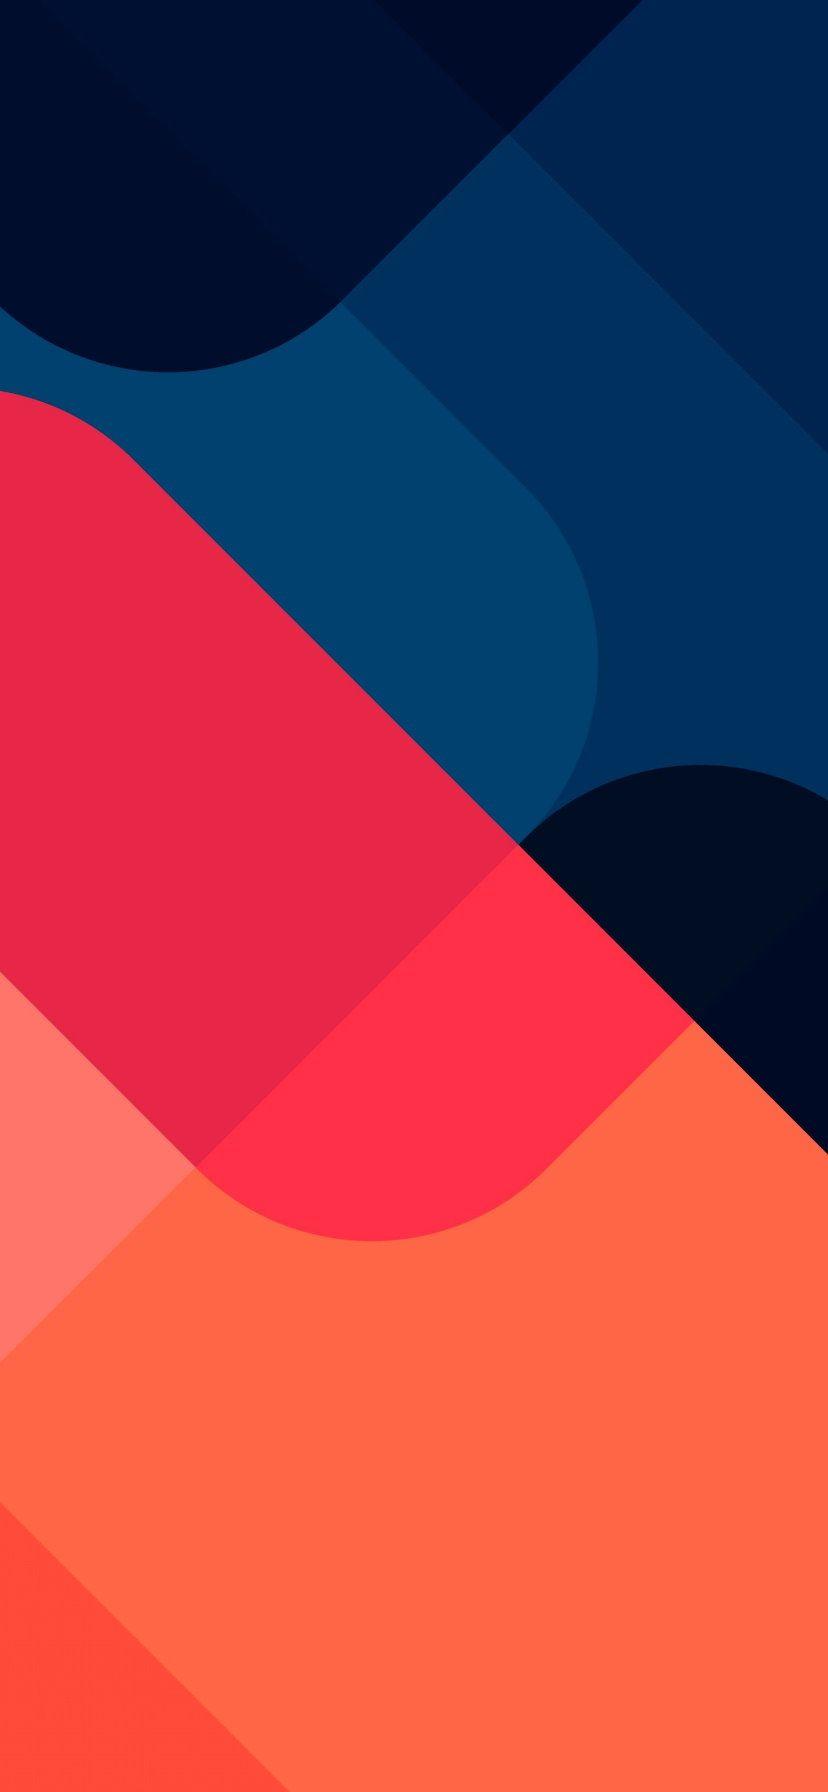 Wallpapers Iphone Xr Fond D Ecran Android Meilleurs Fonds D Ecran Iphone Fond D Ecran Abstrait